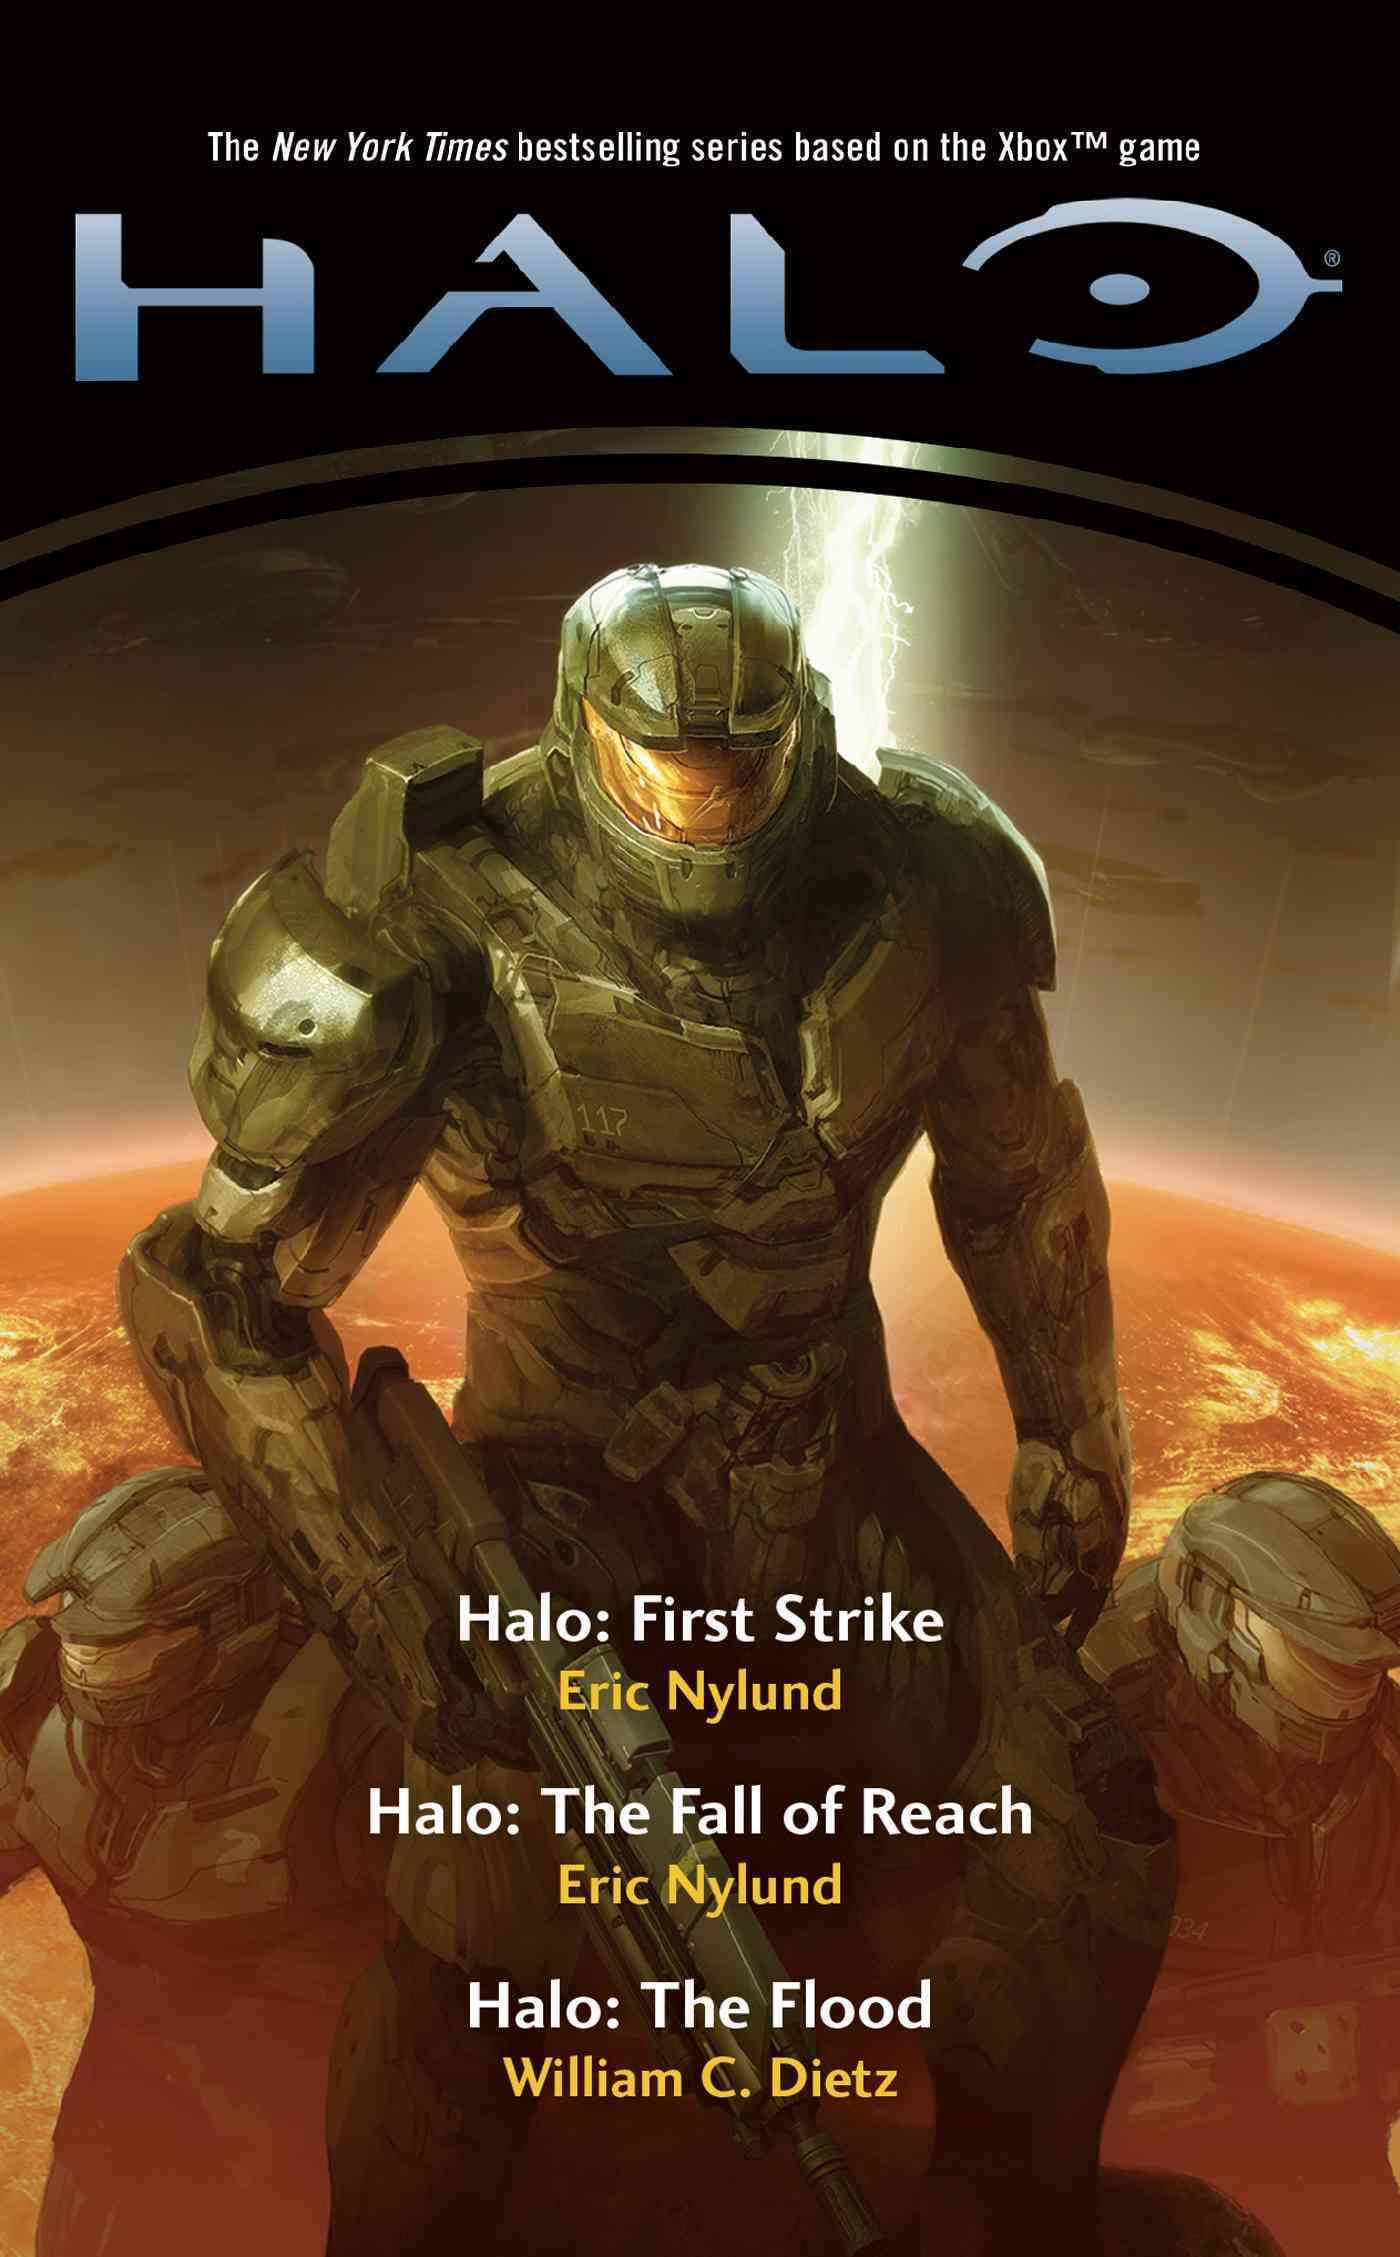 Halo novels: the fall of reach, the flood, first strike.